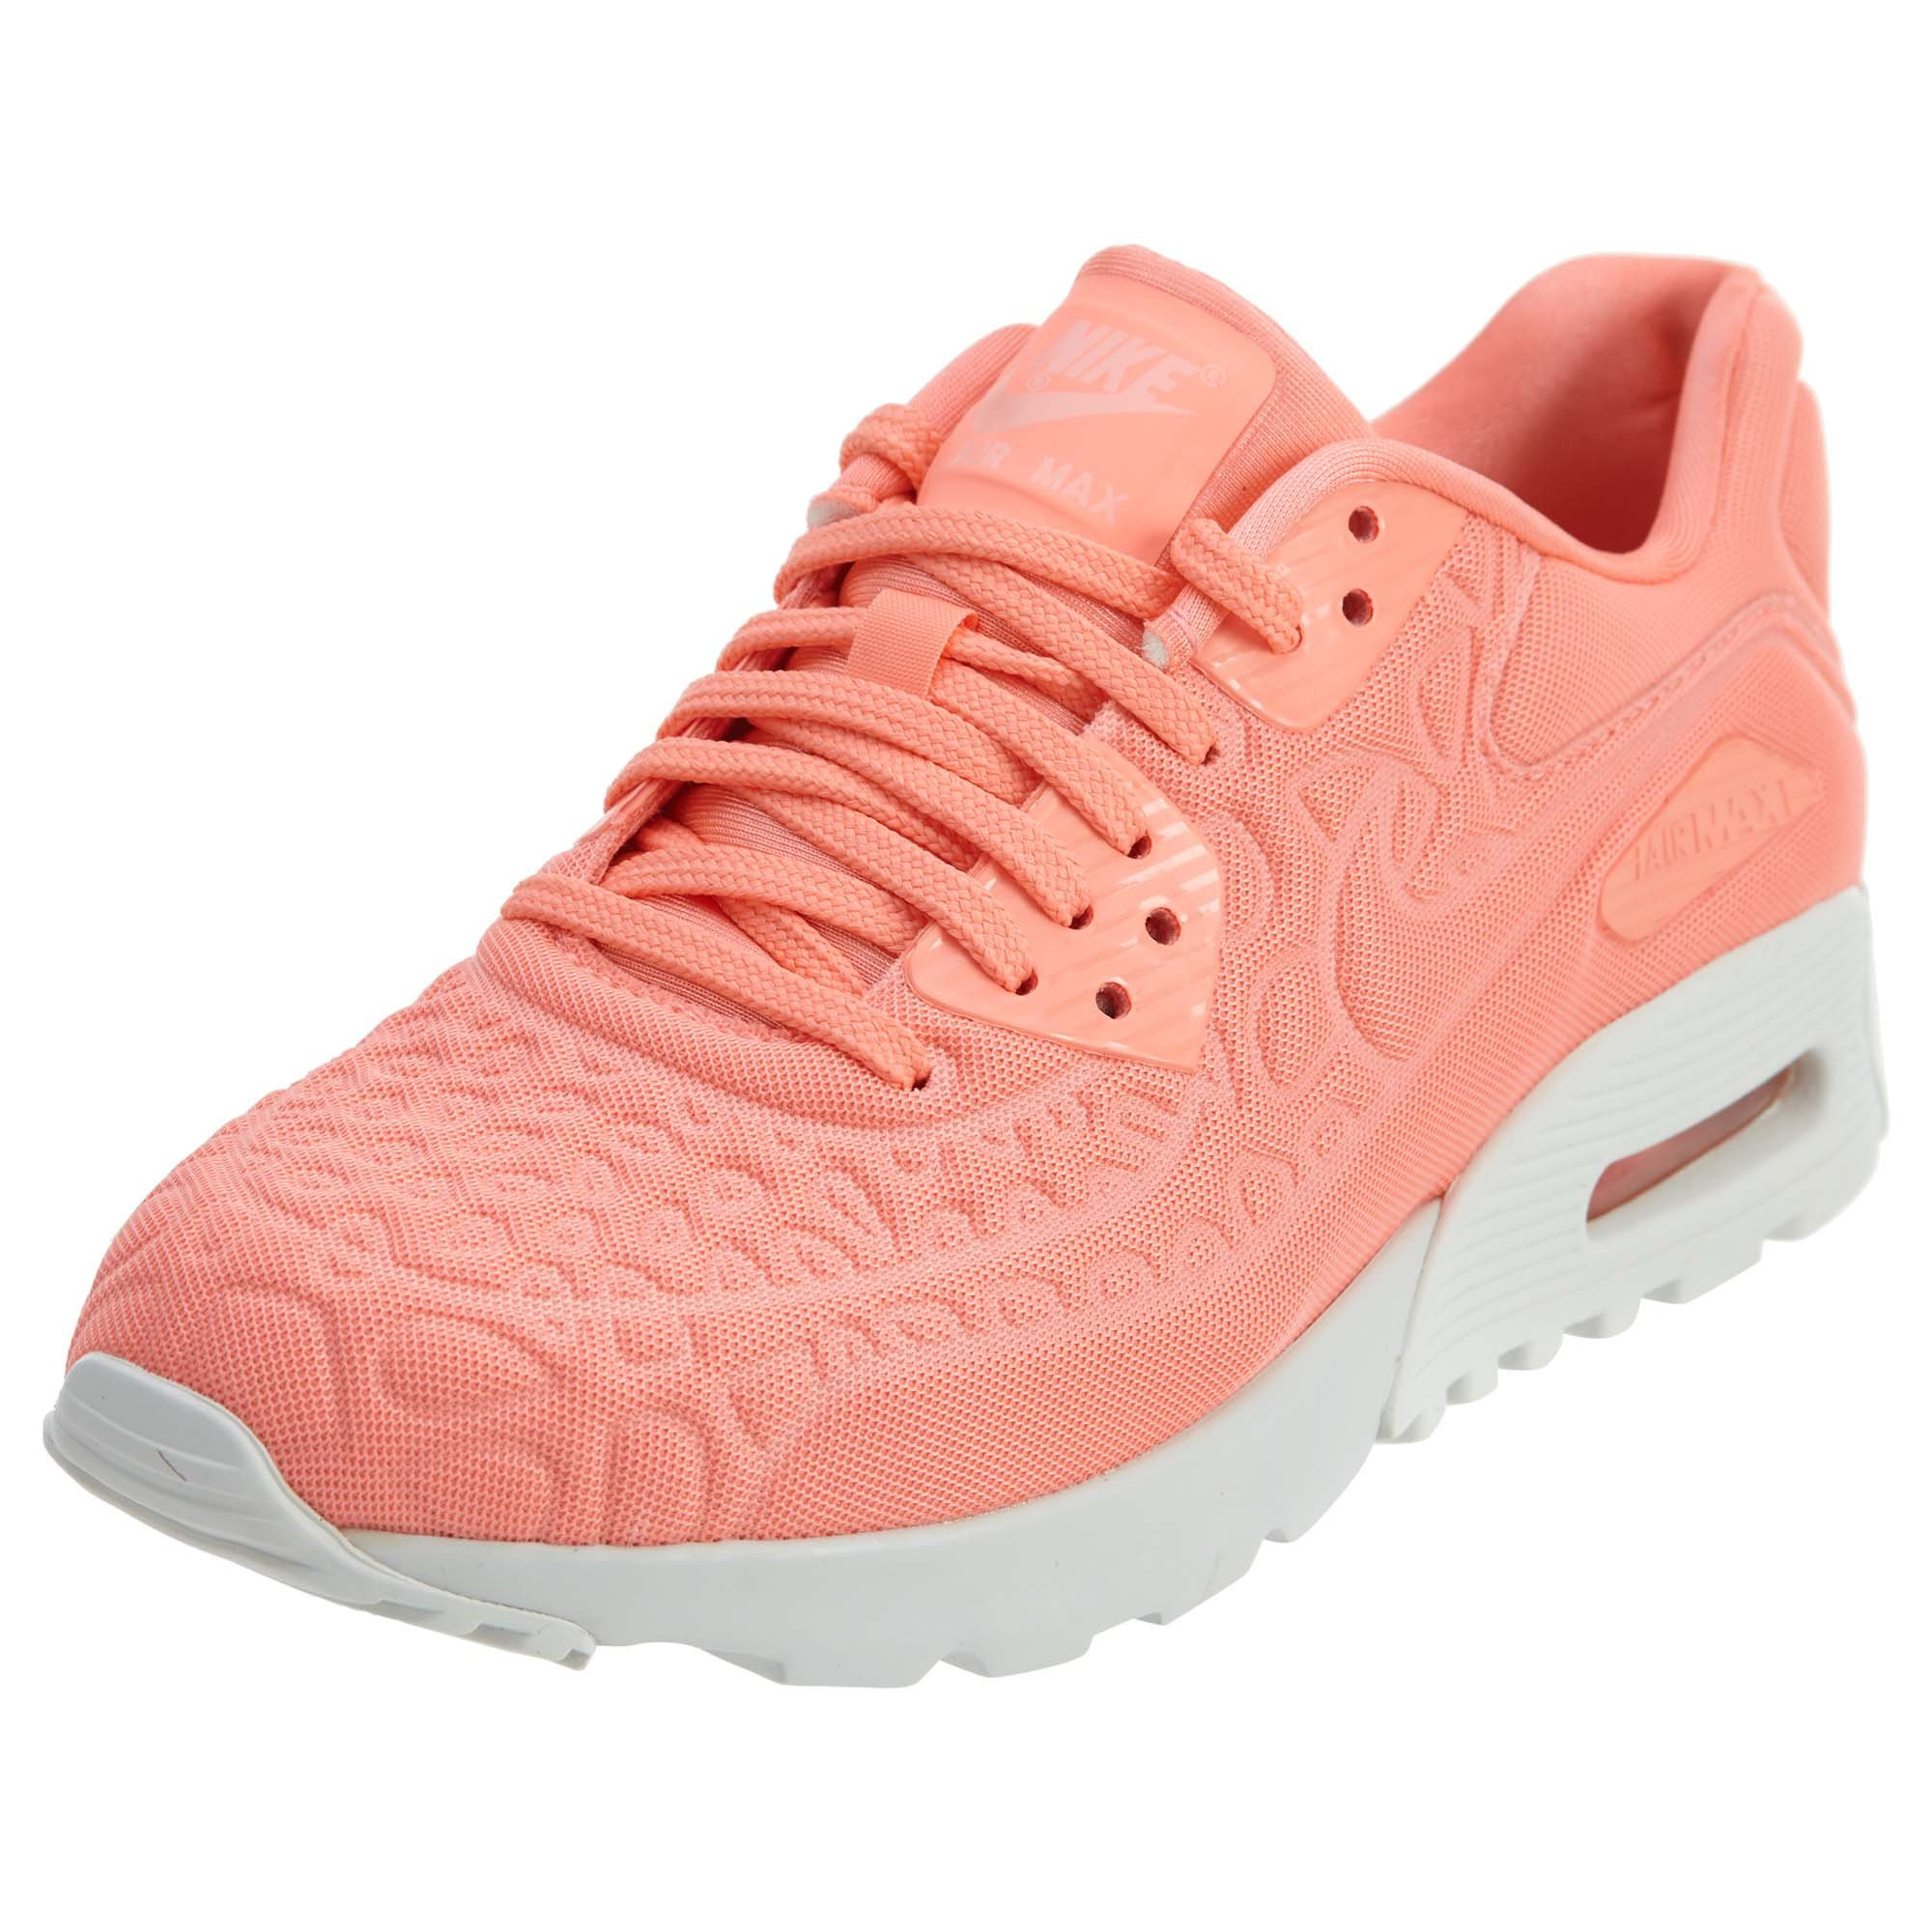 Nike Air Max 90 Ultra Plush Womens Style : 844886-600 Size : 5 B(M) US